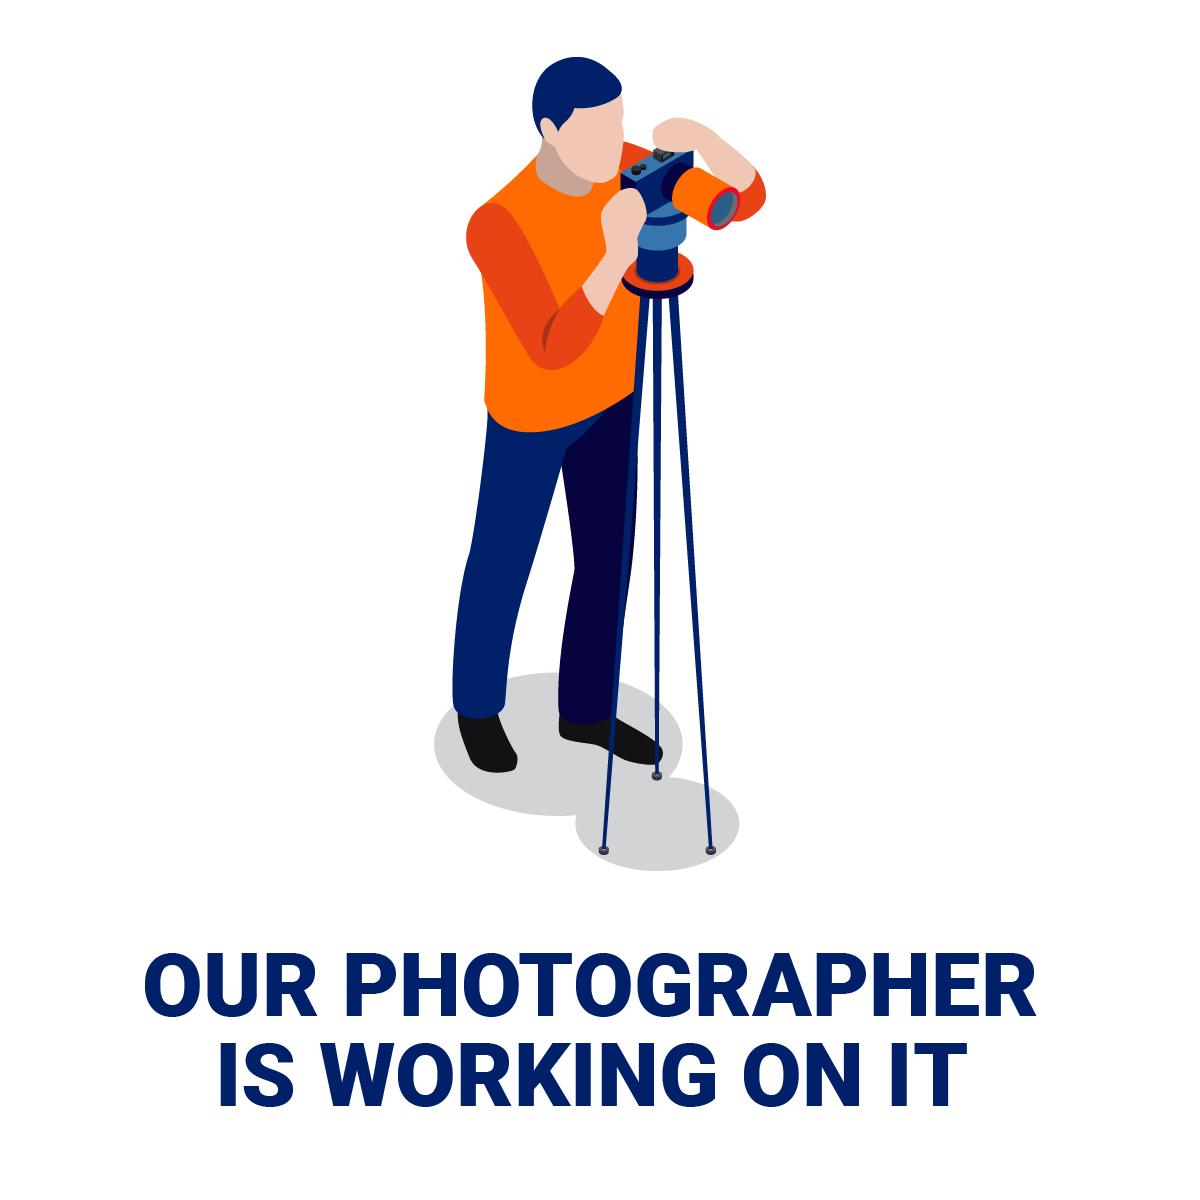 FHV0D R820 HEATSINK5